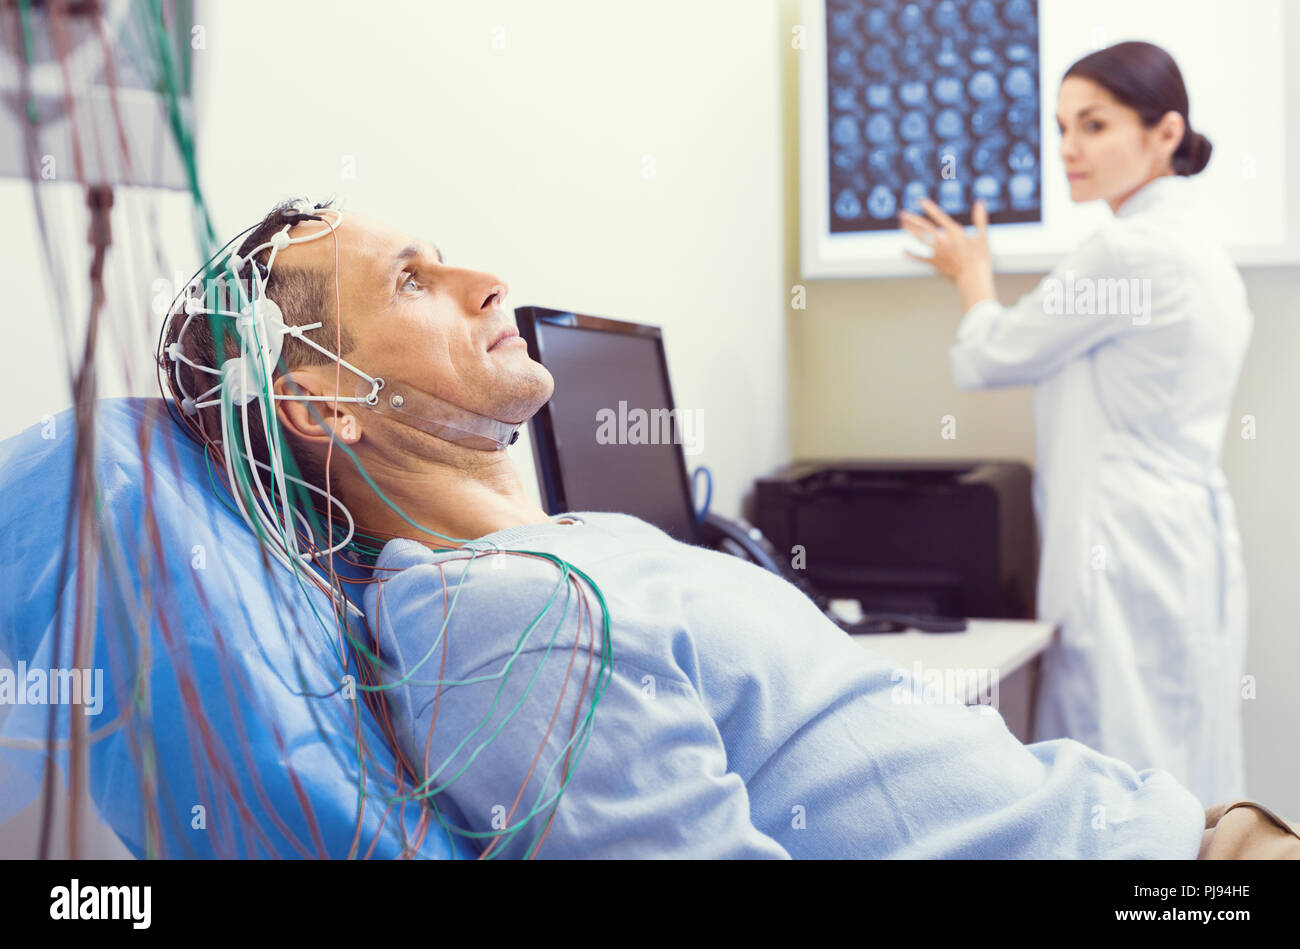 Nervous gentleman getting brain analyzed by electroencephalography machine - Stock Image